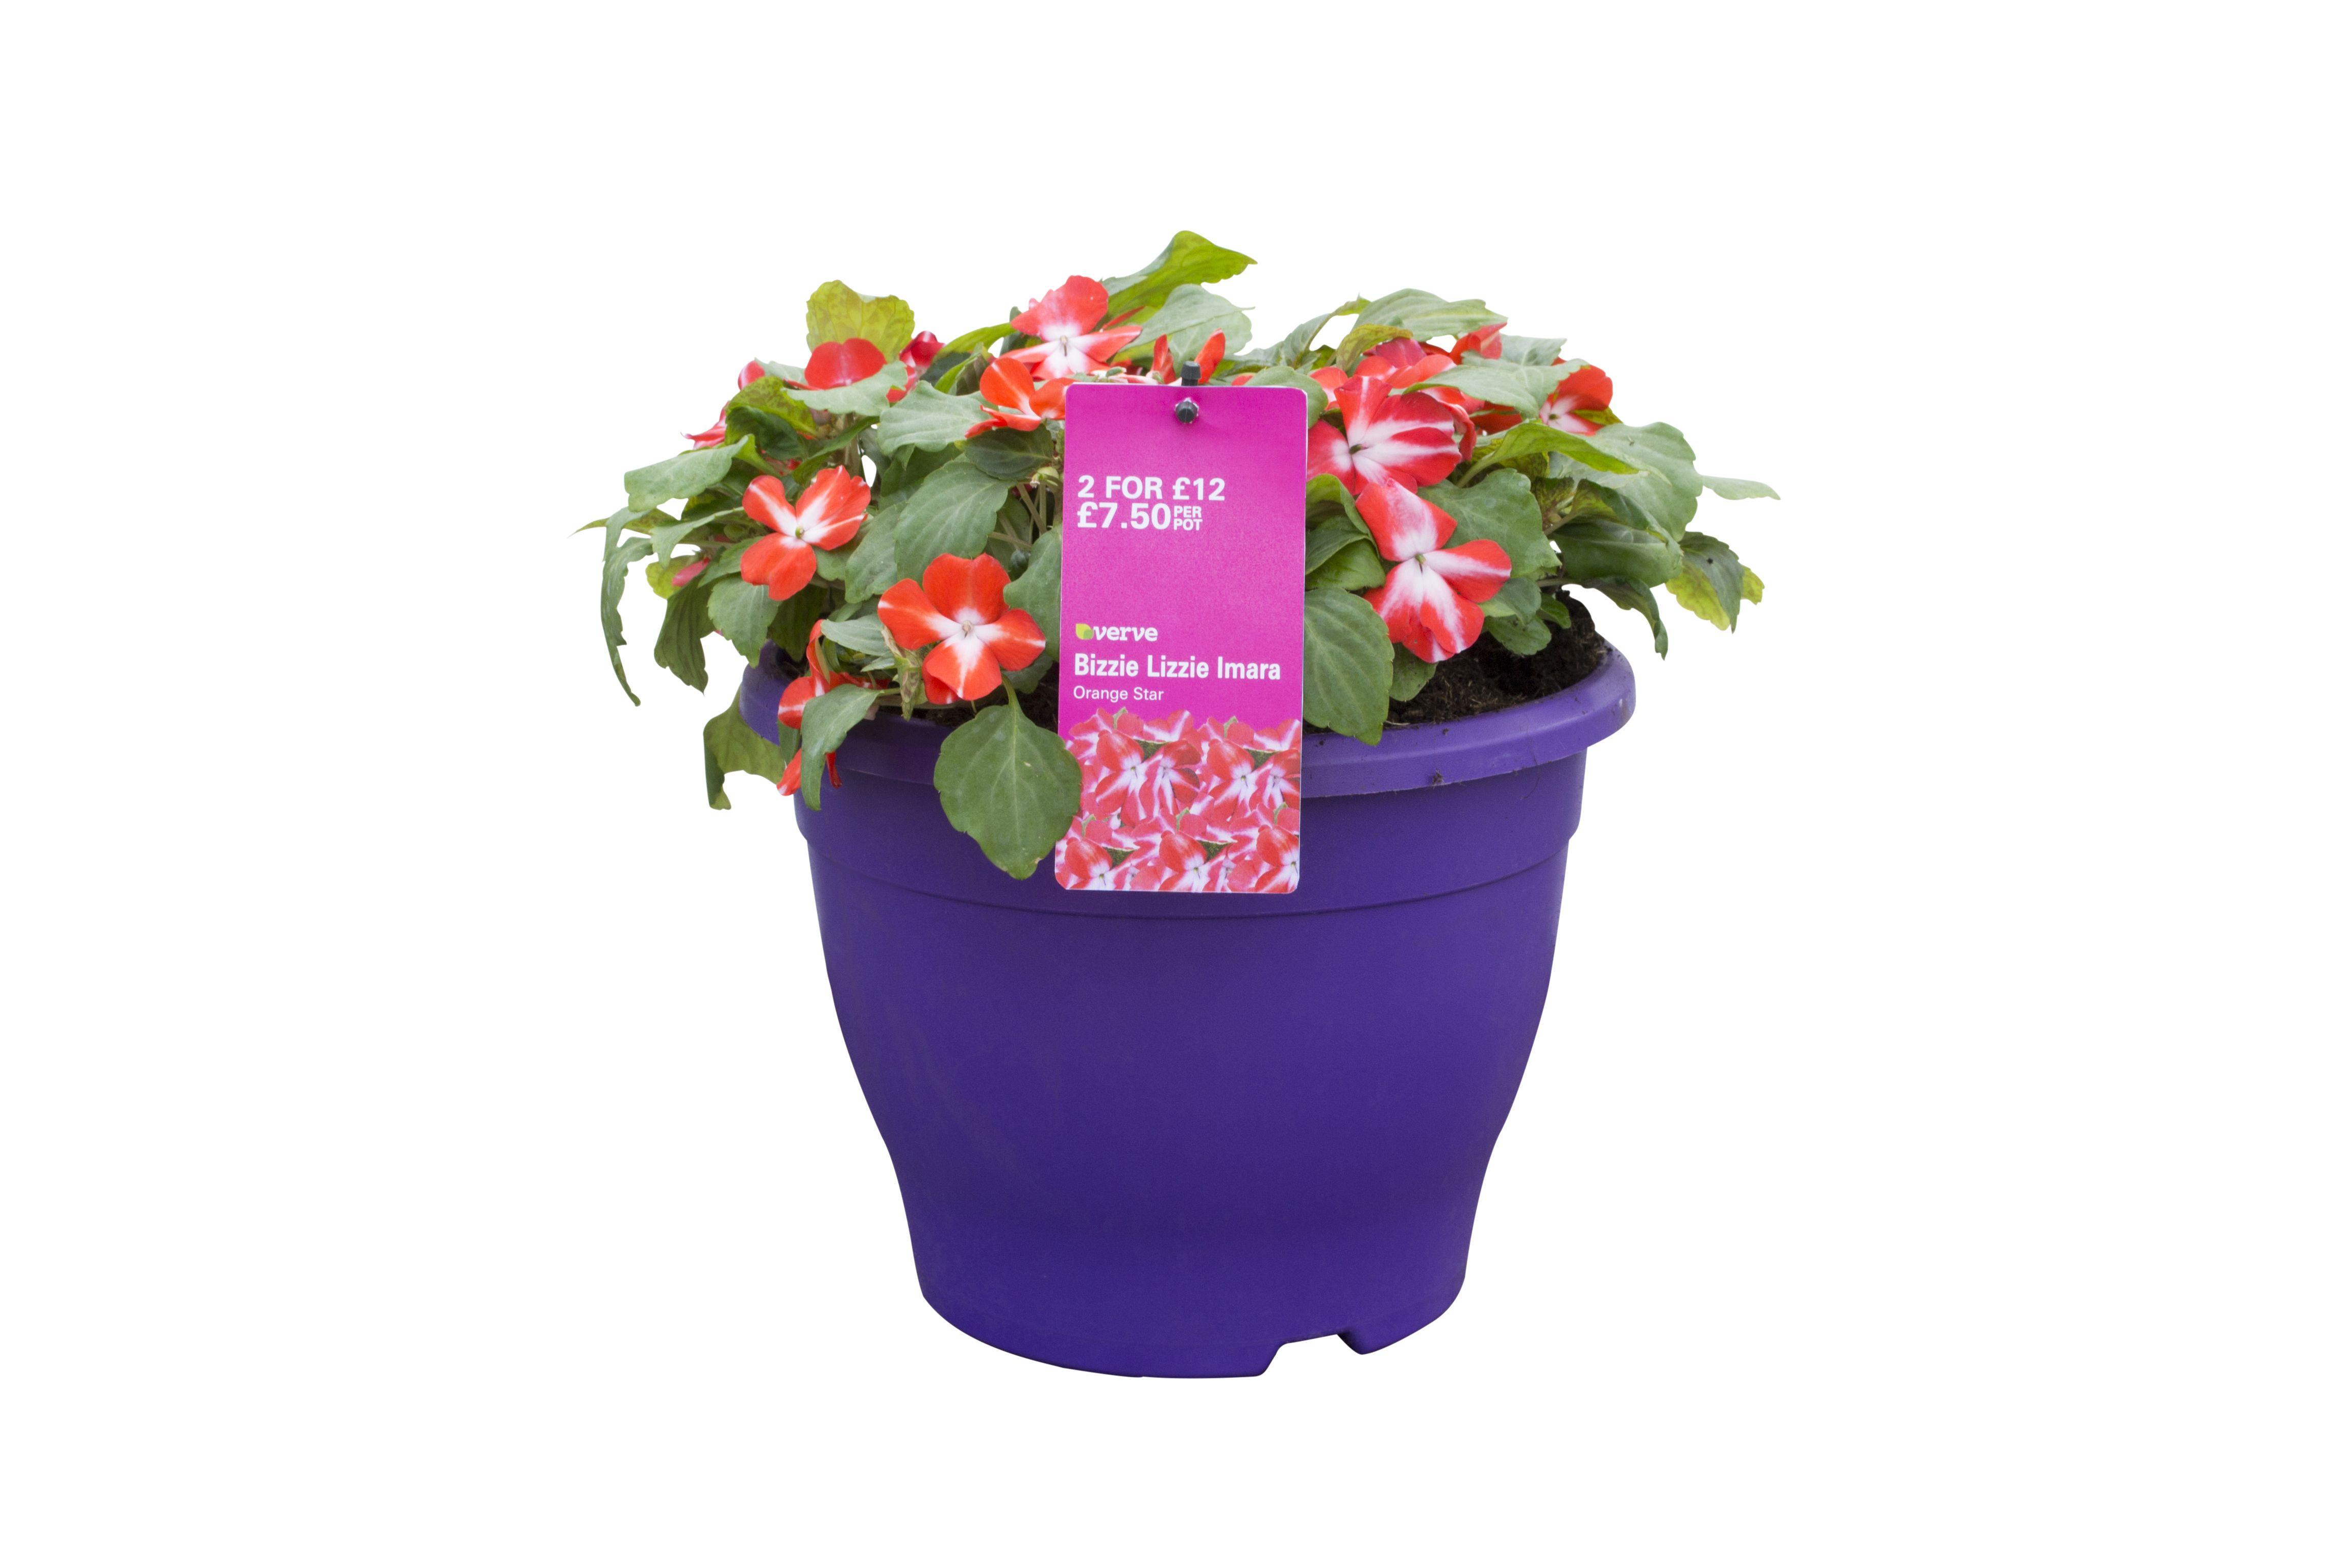 Verve Assorted Imara bizzie lizzie planted container in